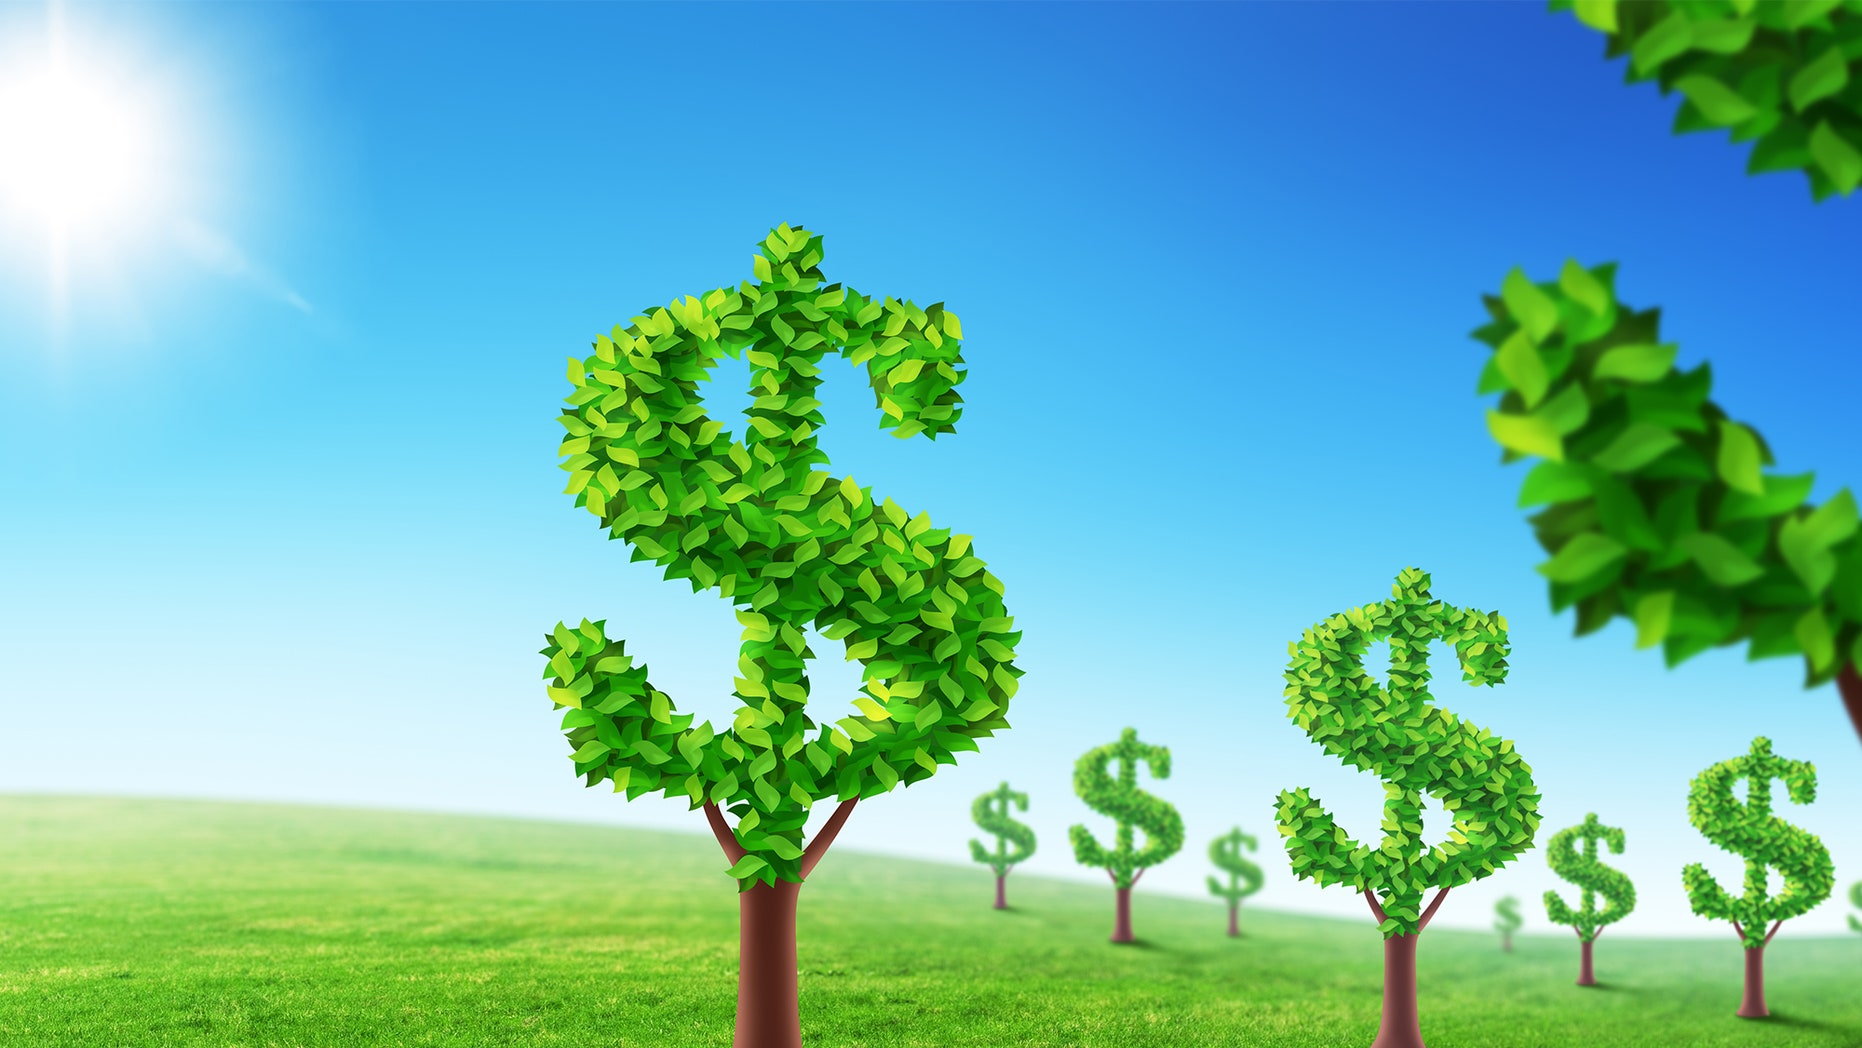 Money-shaped trees